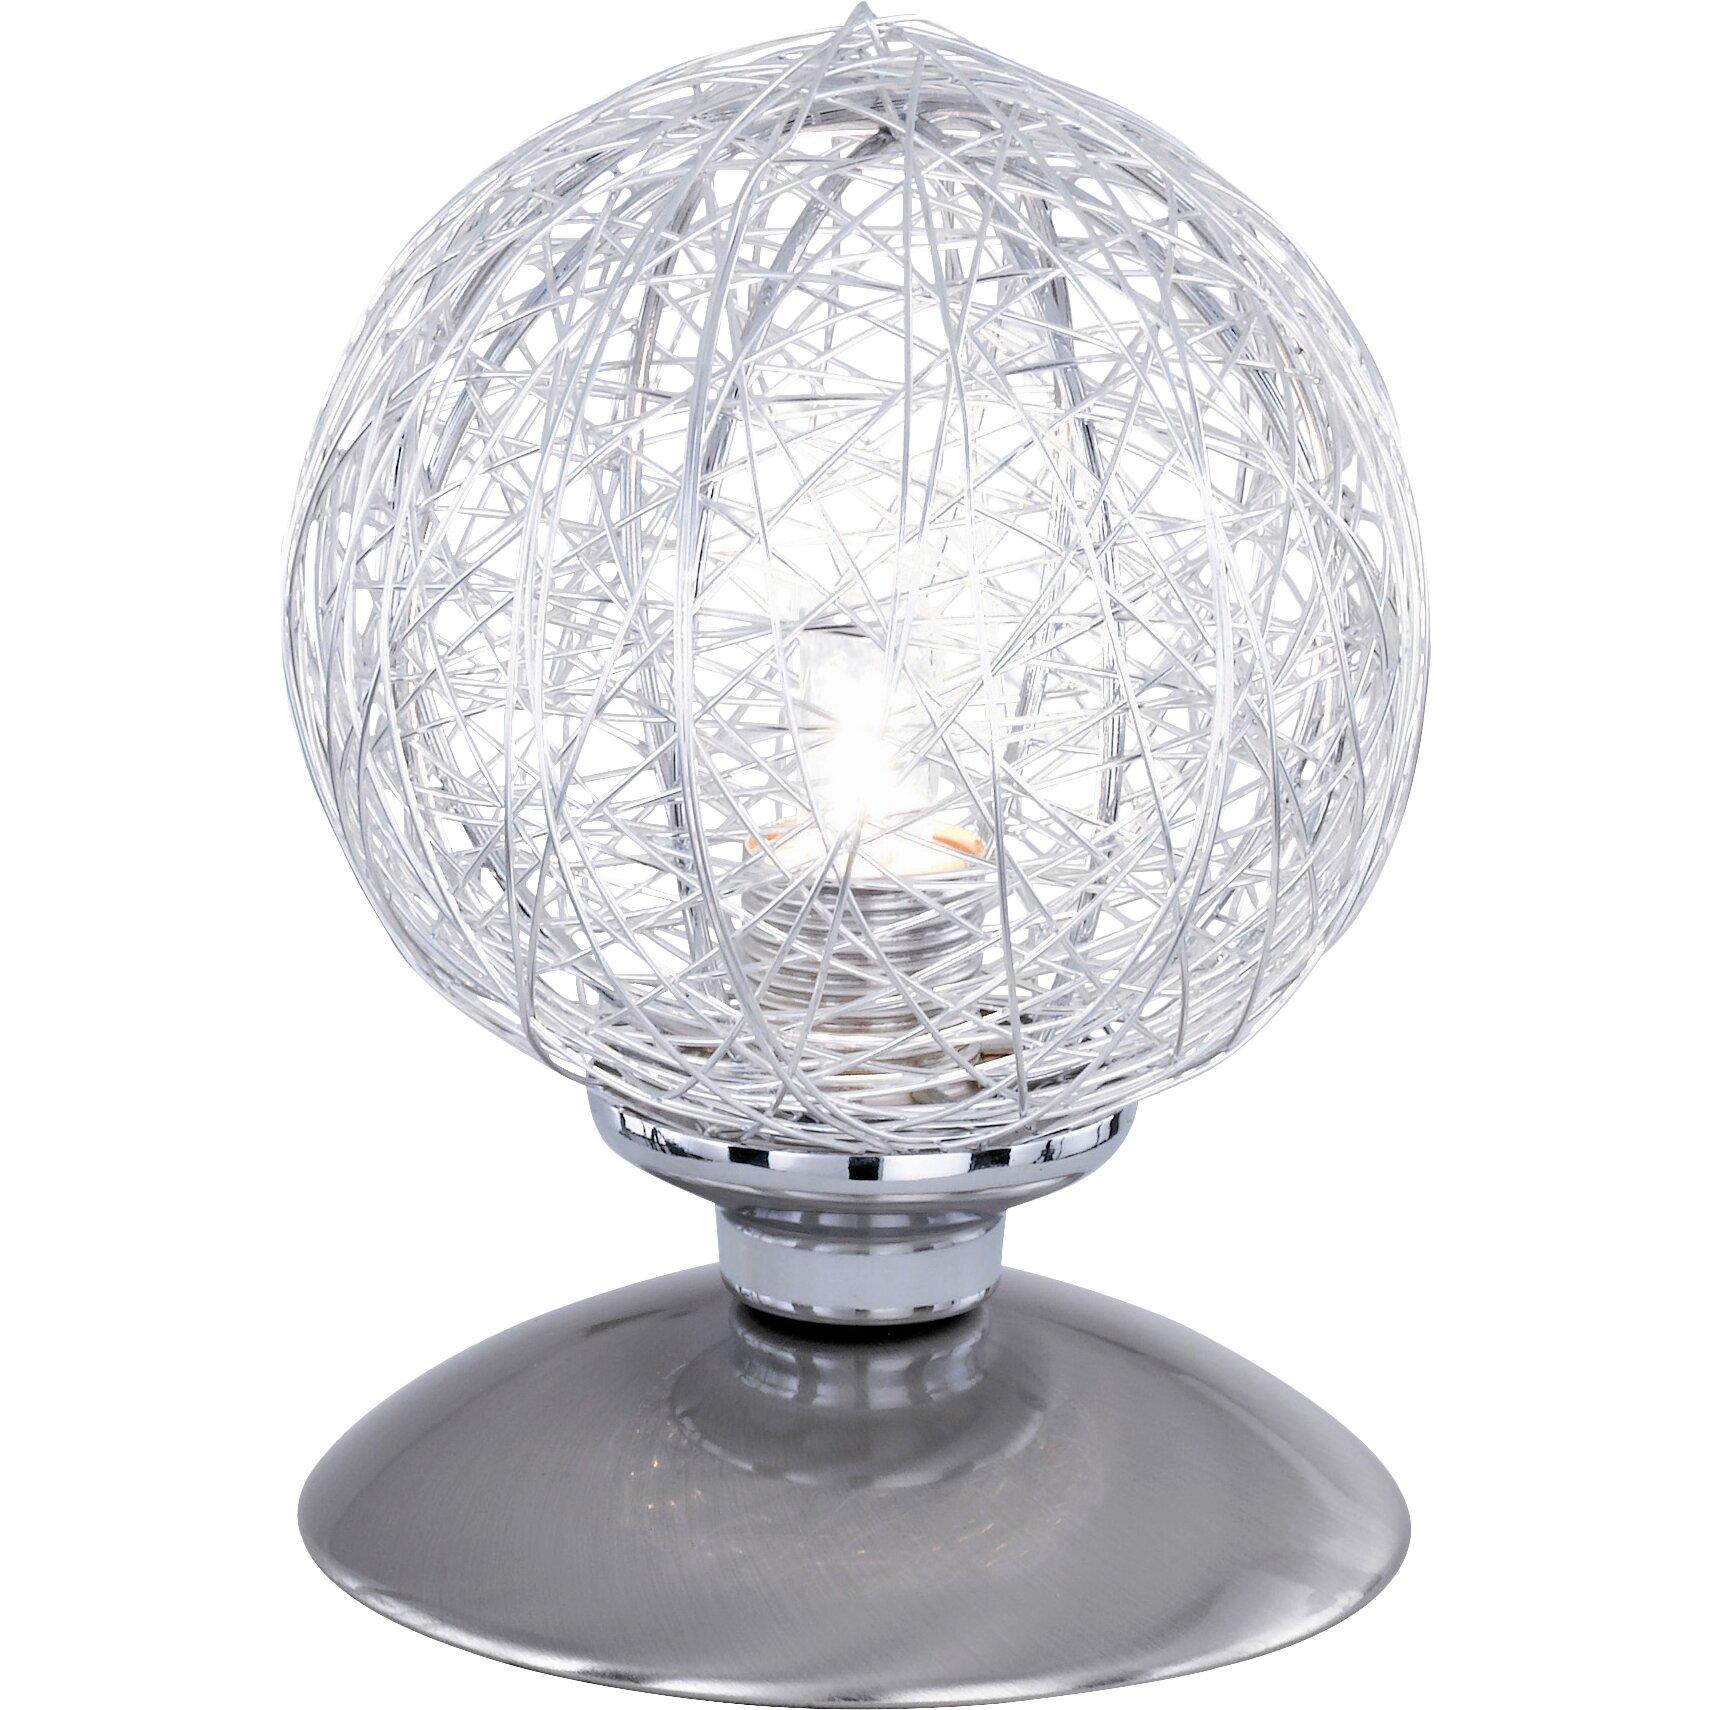 paul neuhaus womble 14cm table lamp wayfair uk. Black Bedroom Furniture Sets. Home Design Ideas